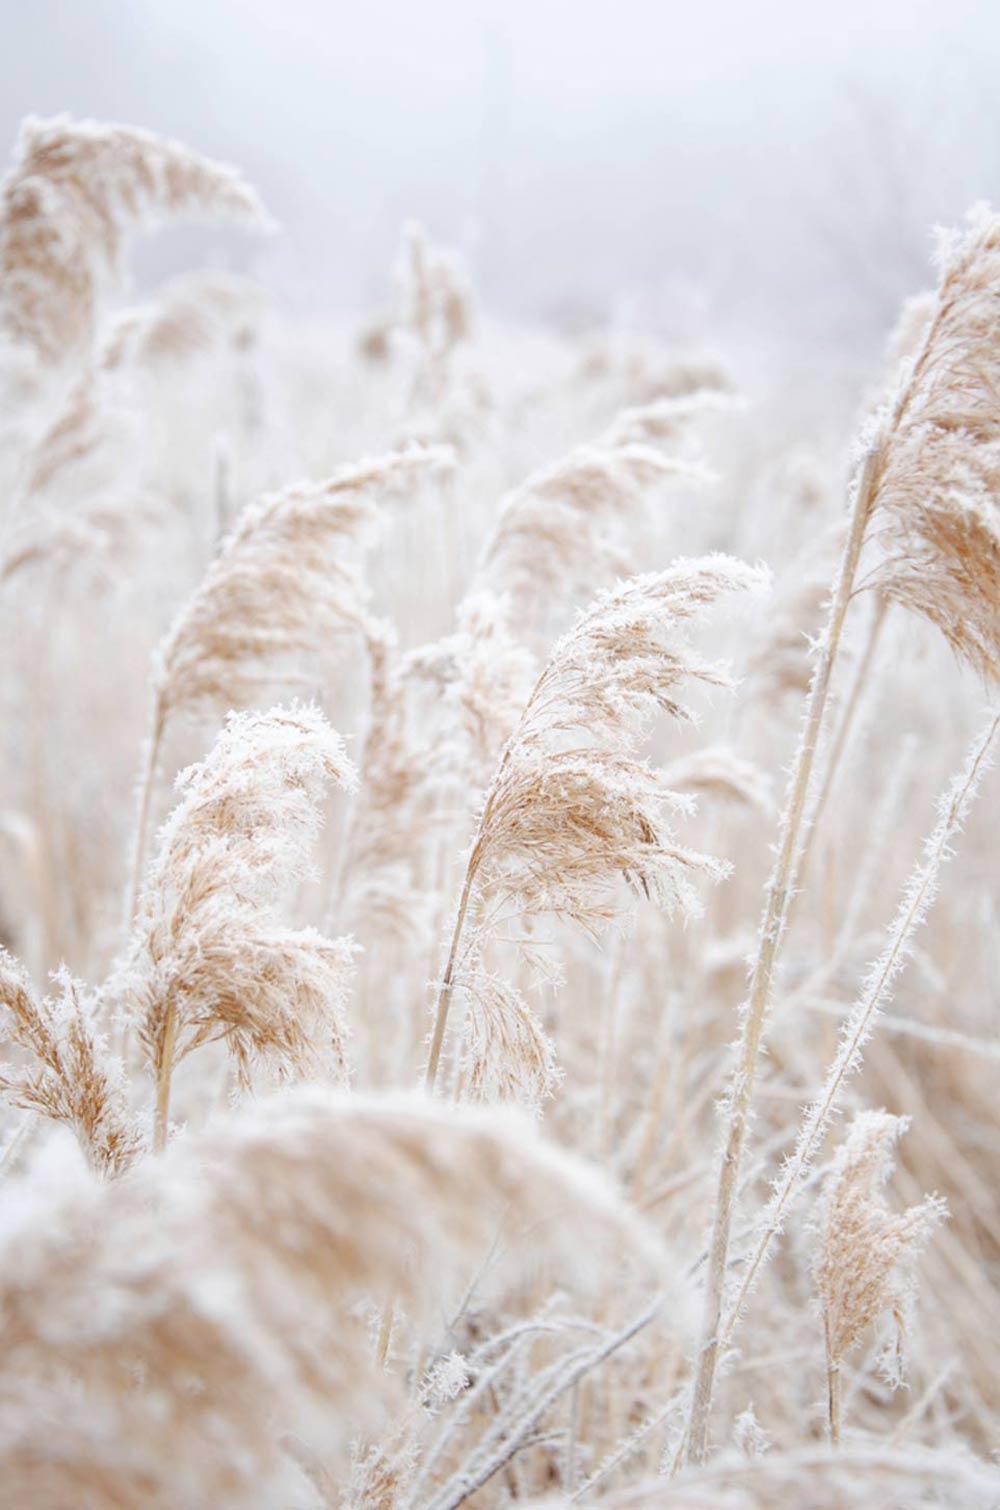 Oracle, Fox, Sunday, Sanctuary, White, Interiors, Exteriors, White, Grass